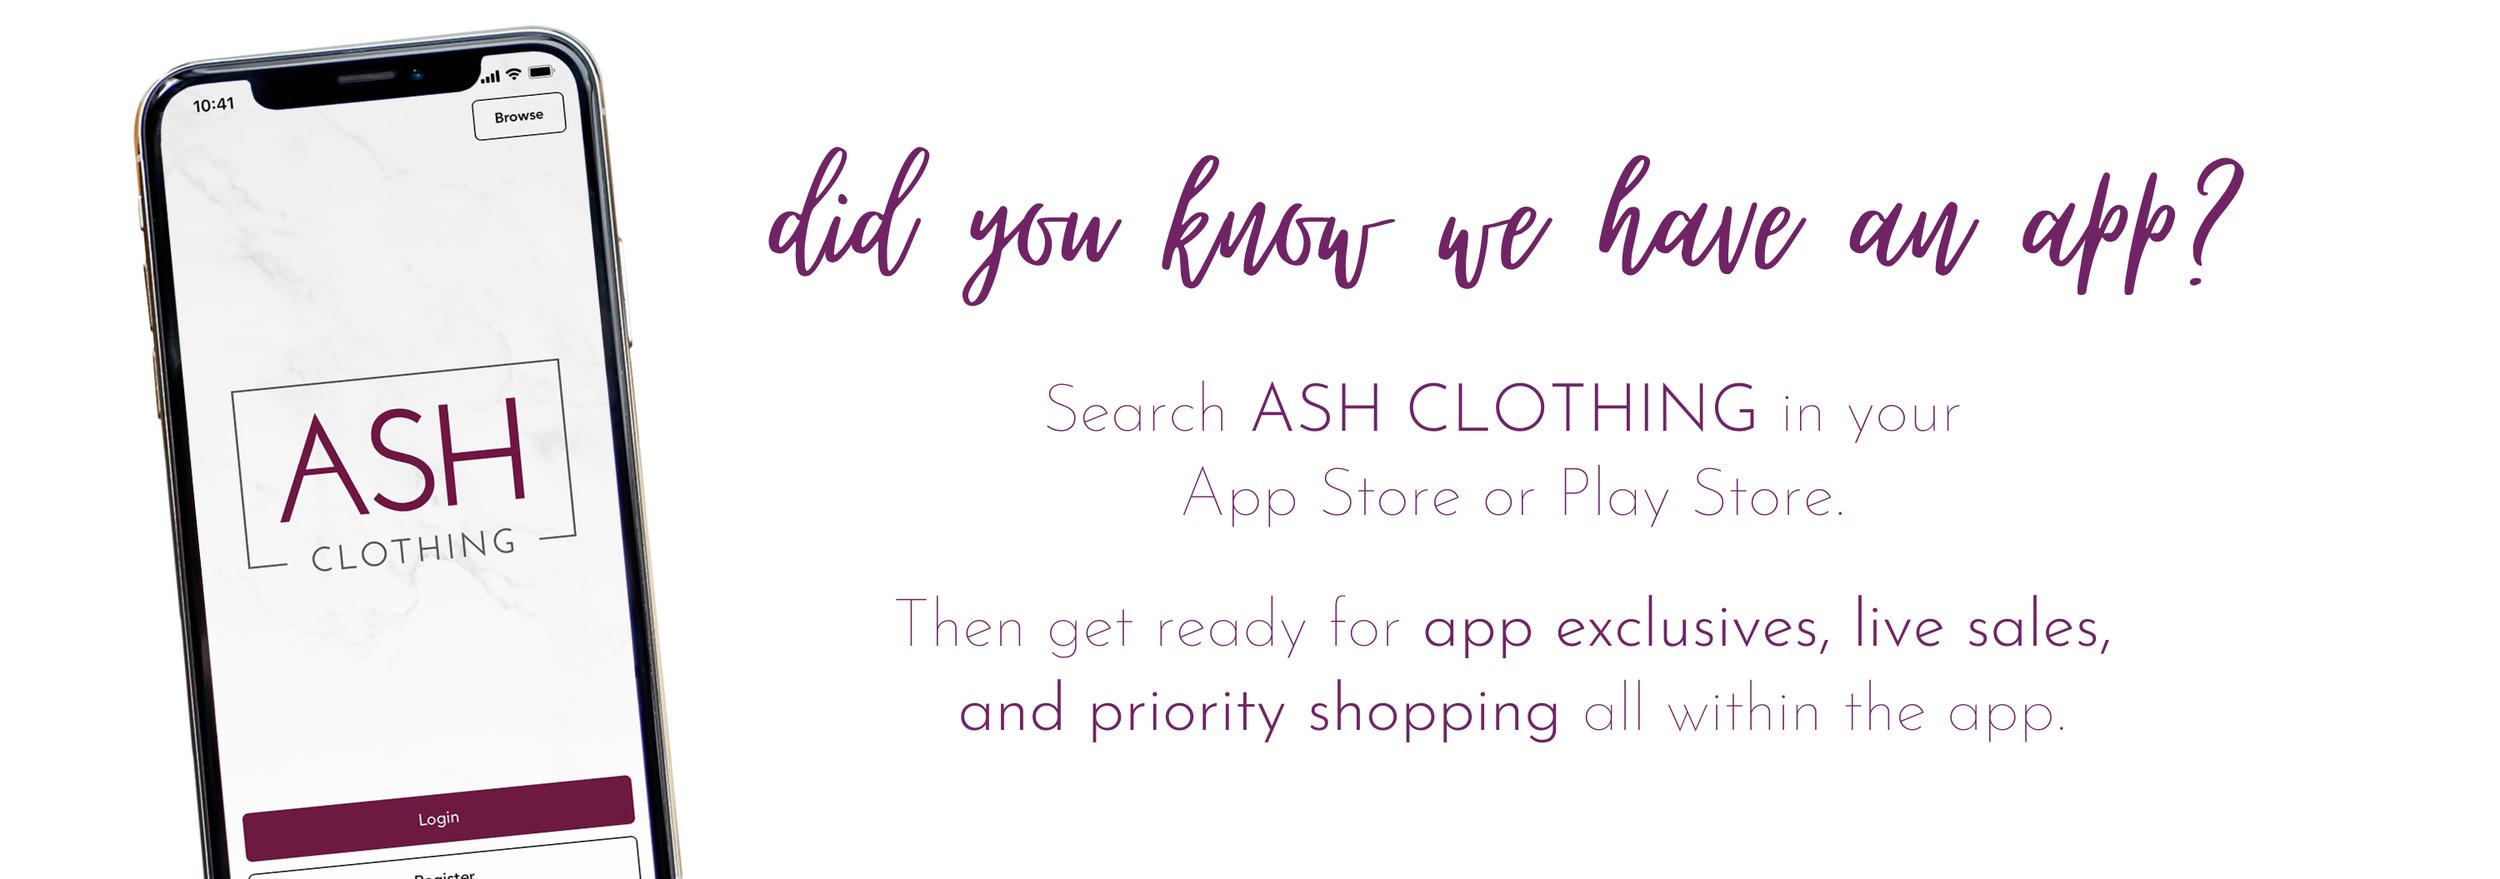 Download The Ash App